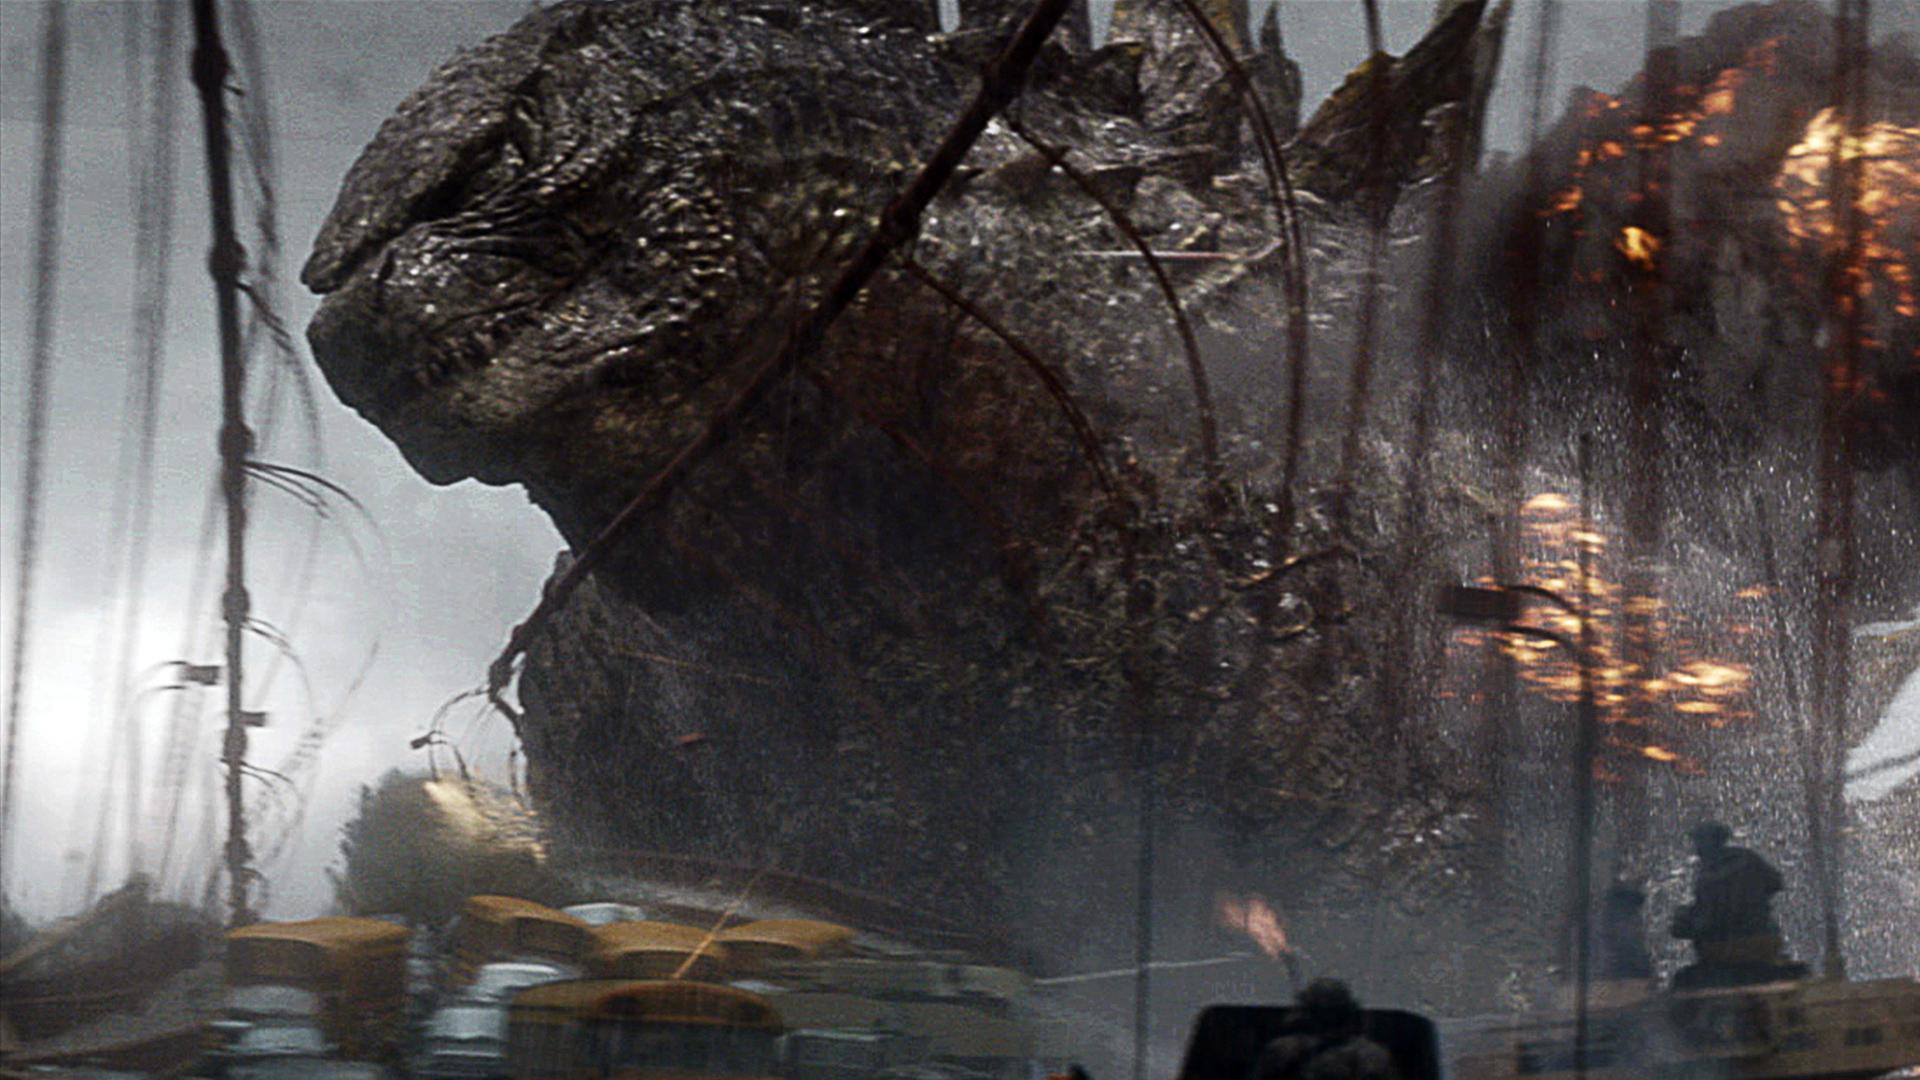 43 Godzilla (2014) HD Wallpapers | Backgrounds - Wallpaper Abyss